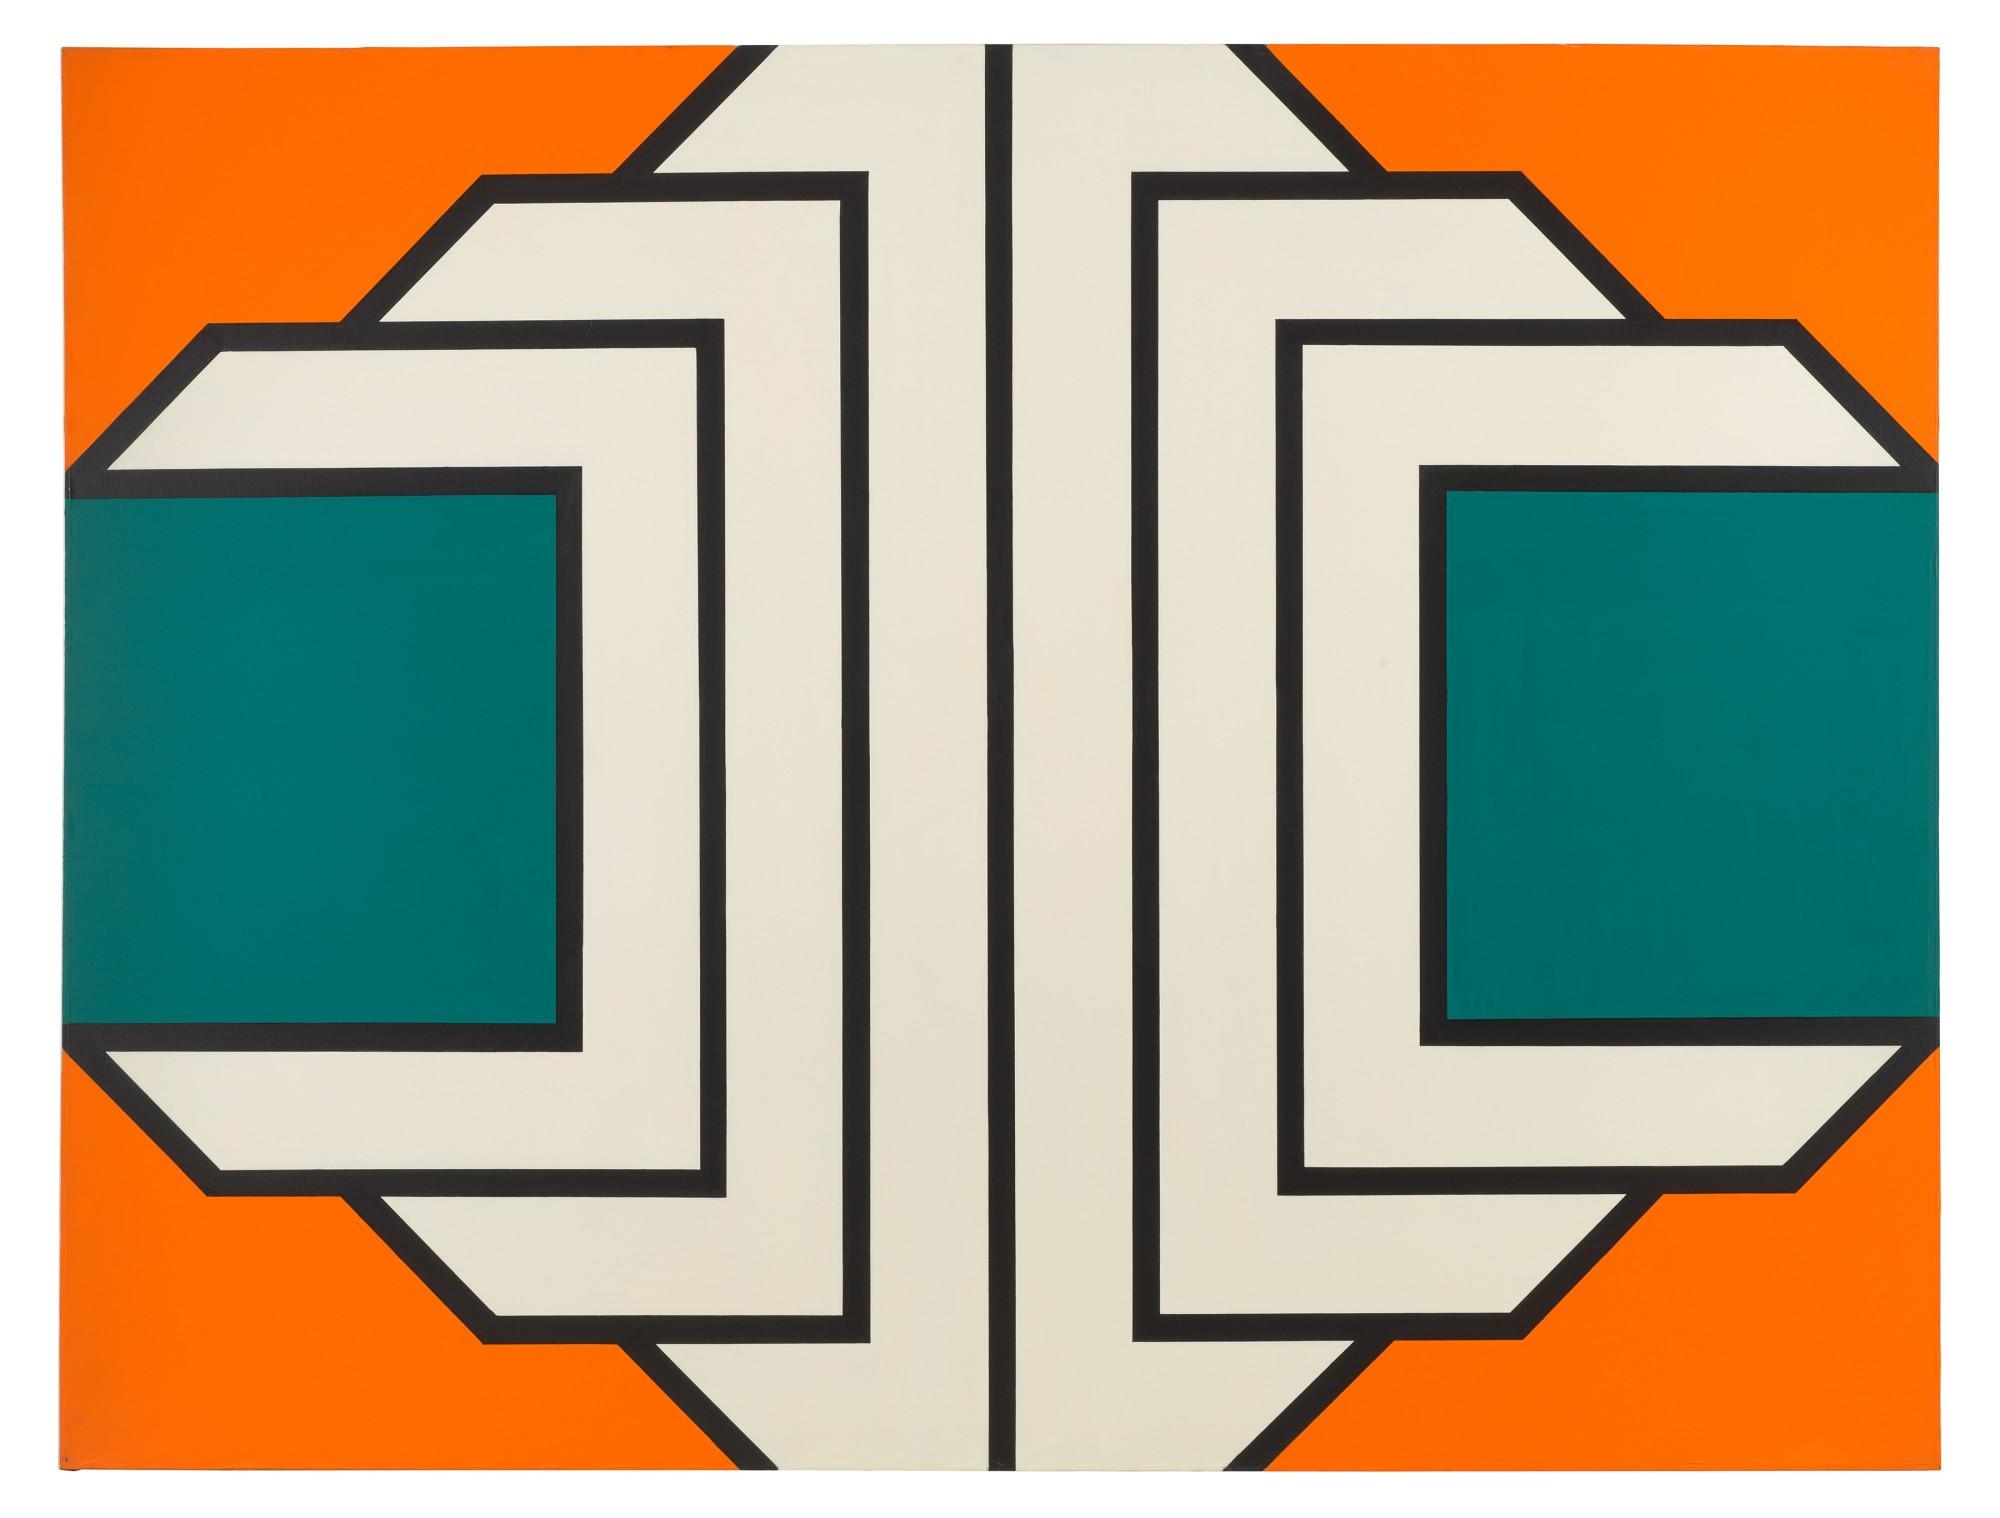 "<span class=""link fancybox-details-link""><a href=""/exhibitions/554/works/artworks_standalone10682/"">View Detail Page</a></span><div class=""artist""><span class=""artist""><strong>IMRE BAK</strong></span></div><div class=""title""><em>Blue</em>, 1969</div><div class=""medium"">Acrylic on canvas</div><div class=""dimensions"">150 x 200 cm<br />59 x 78 ¾ inches</div>"